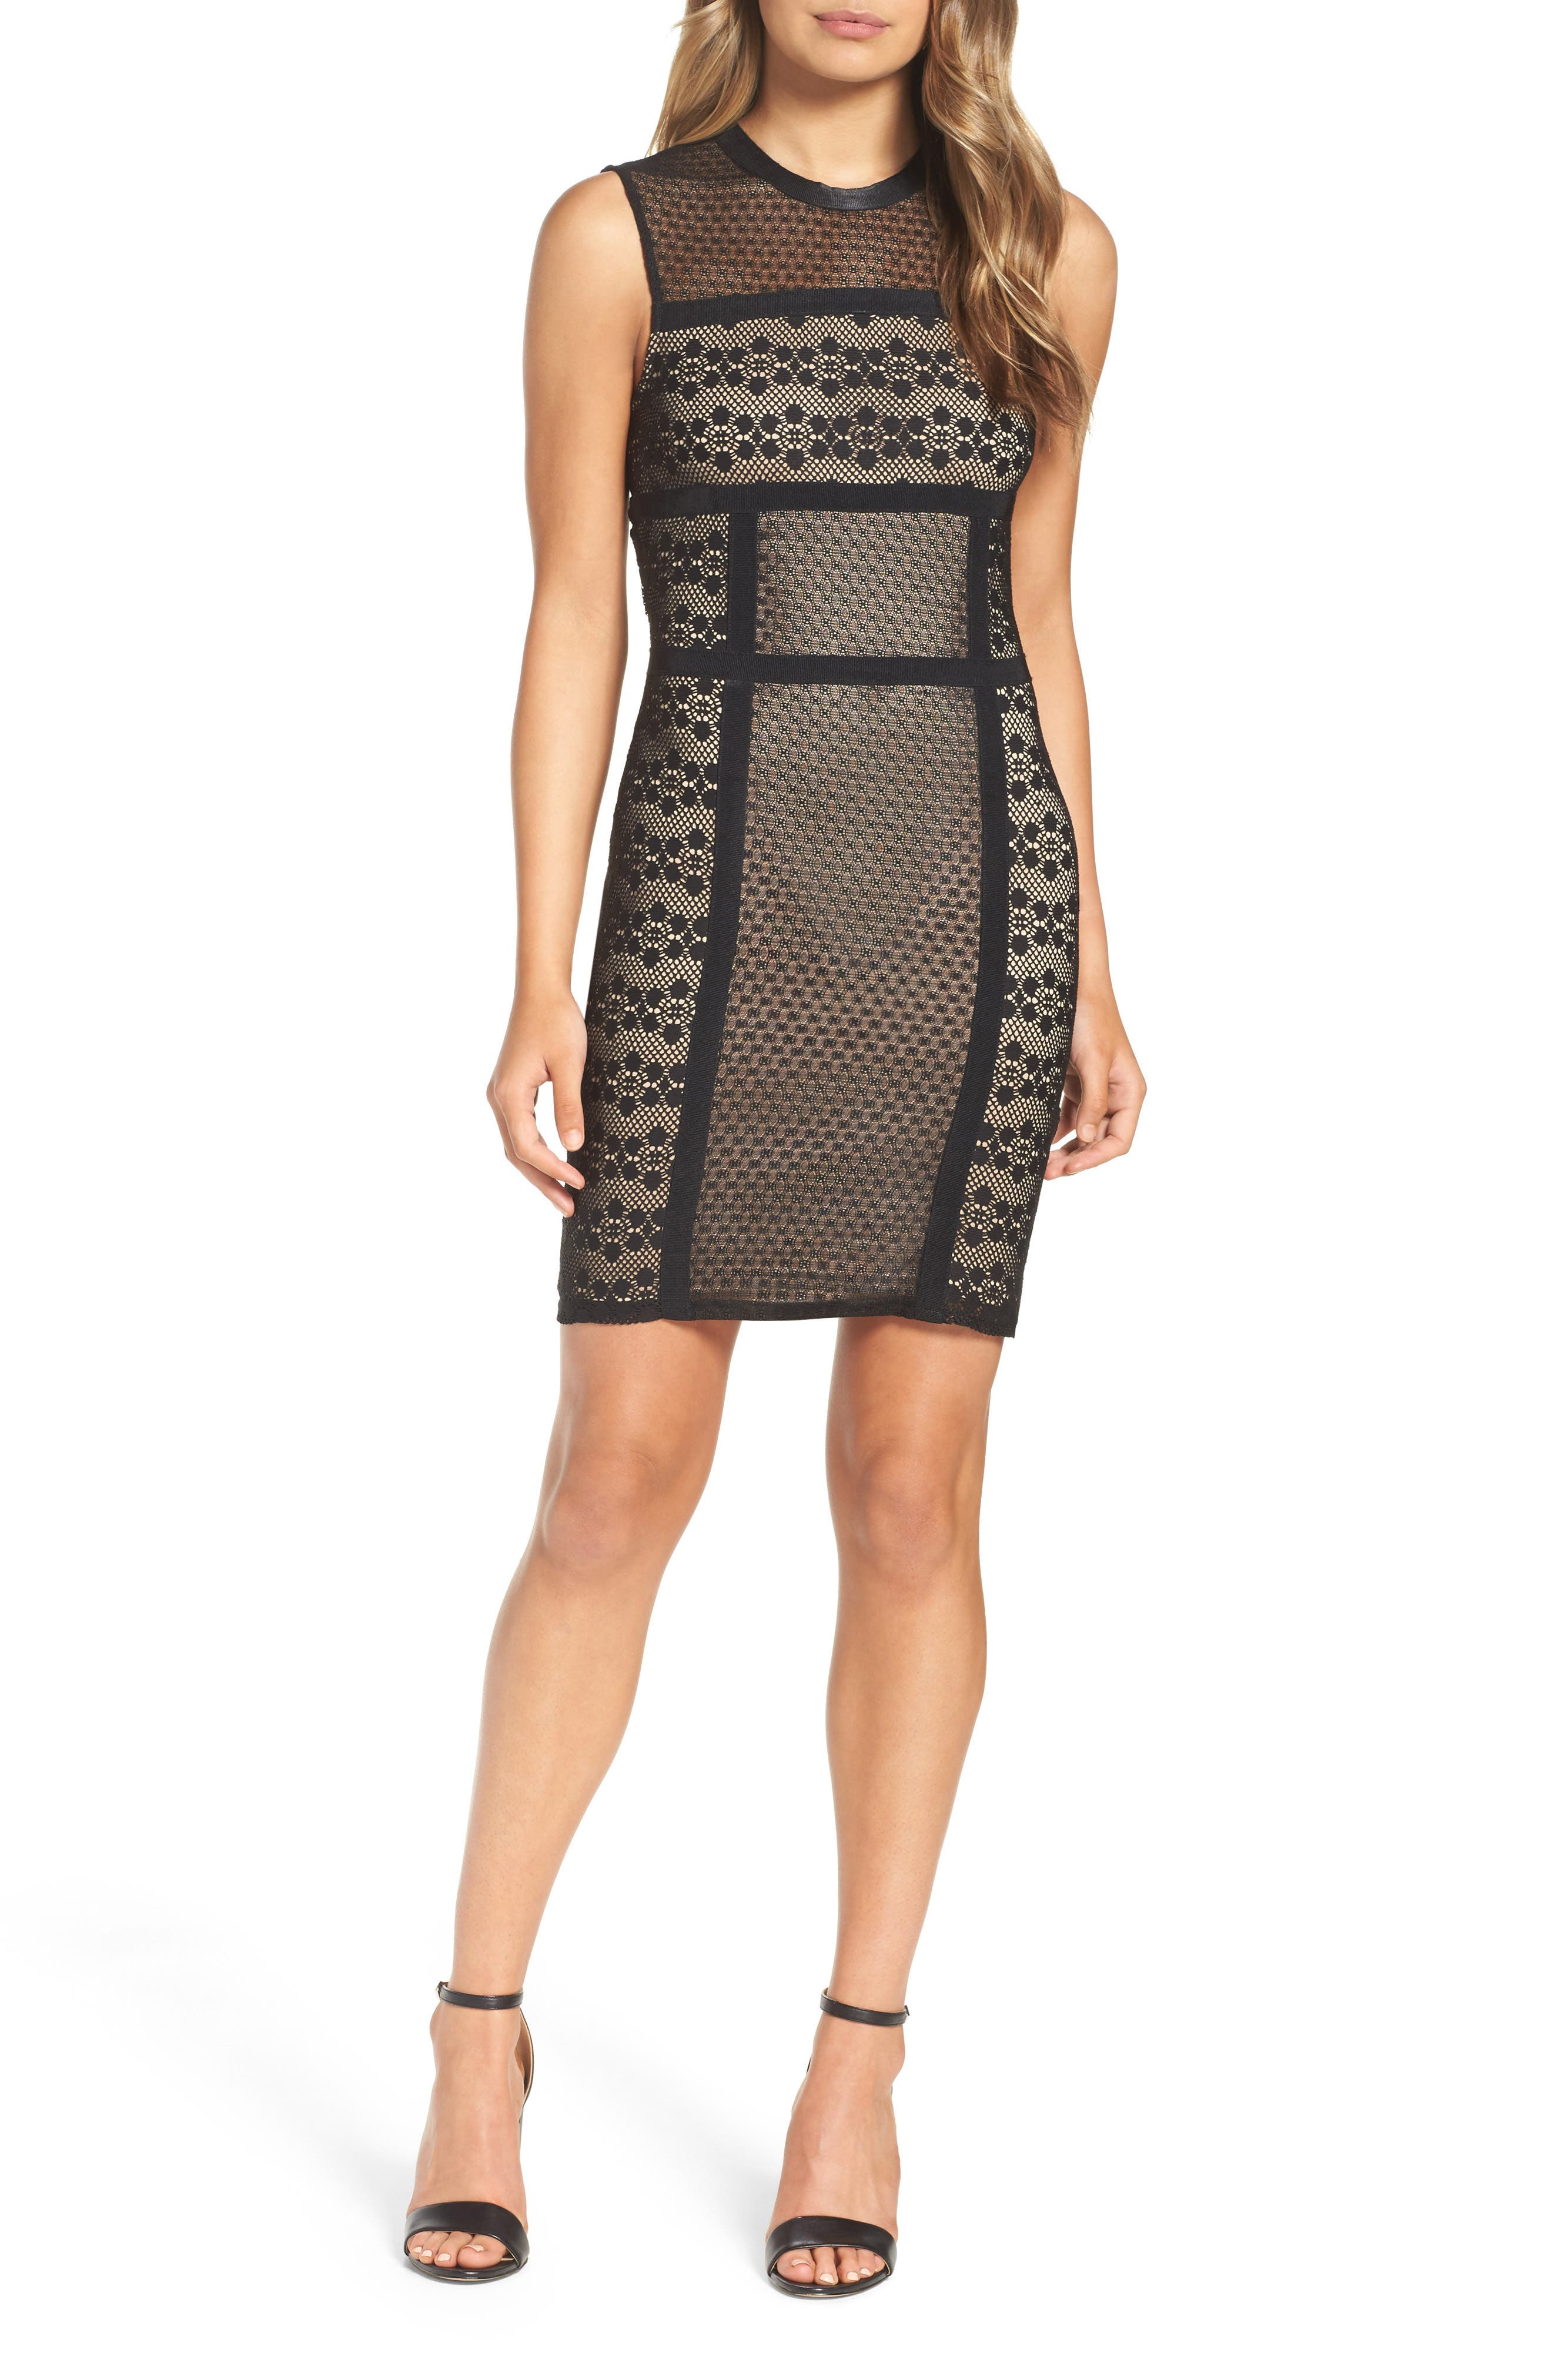 Hola Mamacita Body-Con Dress,                             Main thumbnail 1, color,                             001